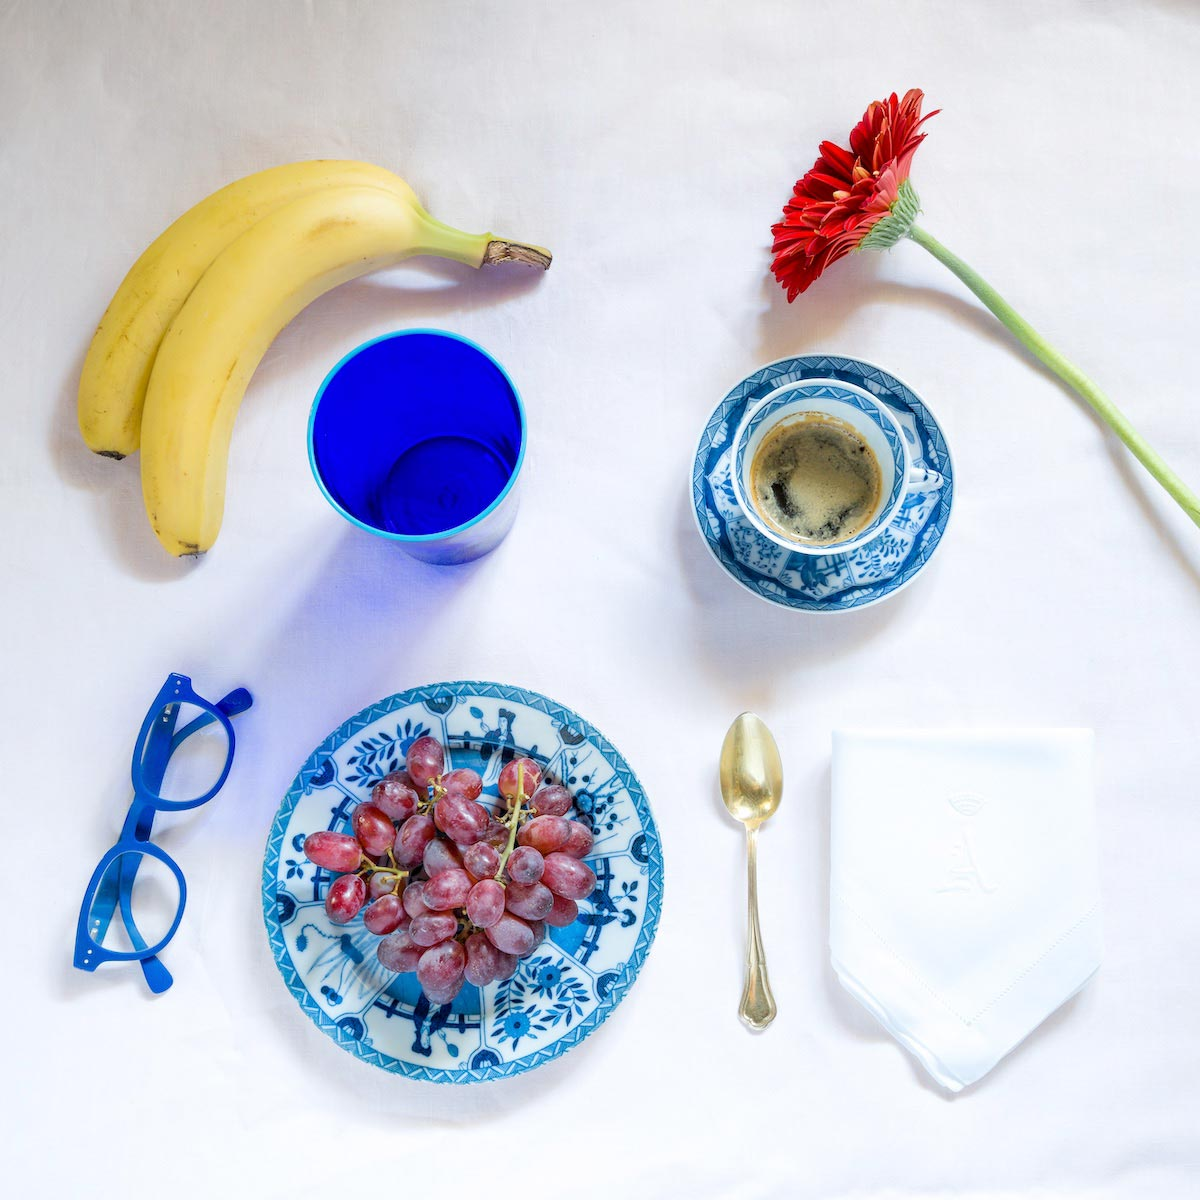 mare-beach-glasses-glass-water-sea-perfect-luxury-sand-beachhouse-house-blue-murano-handmade-designer